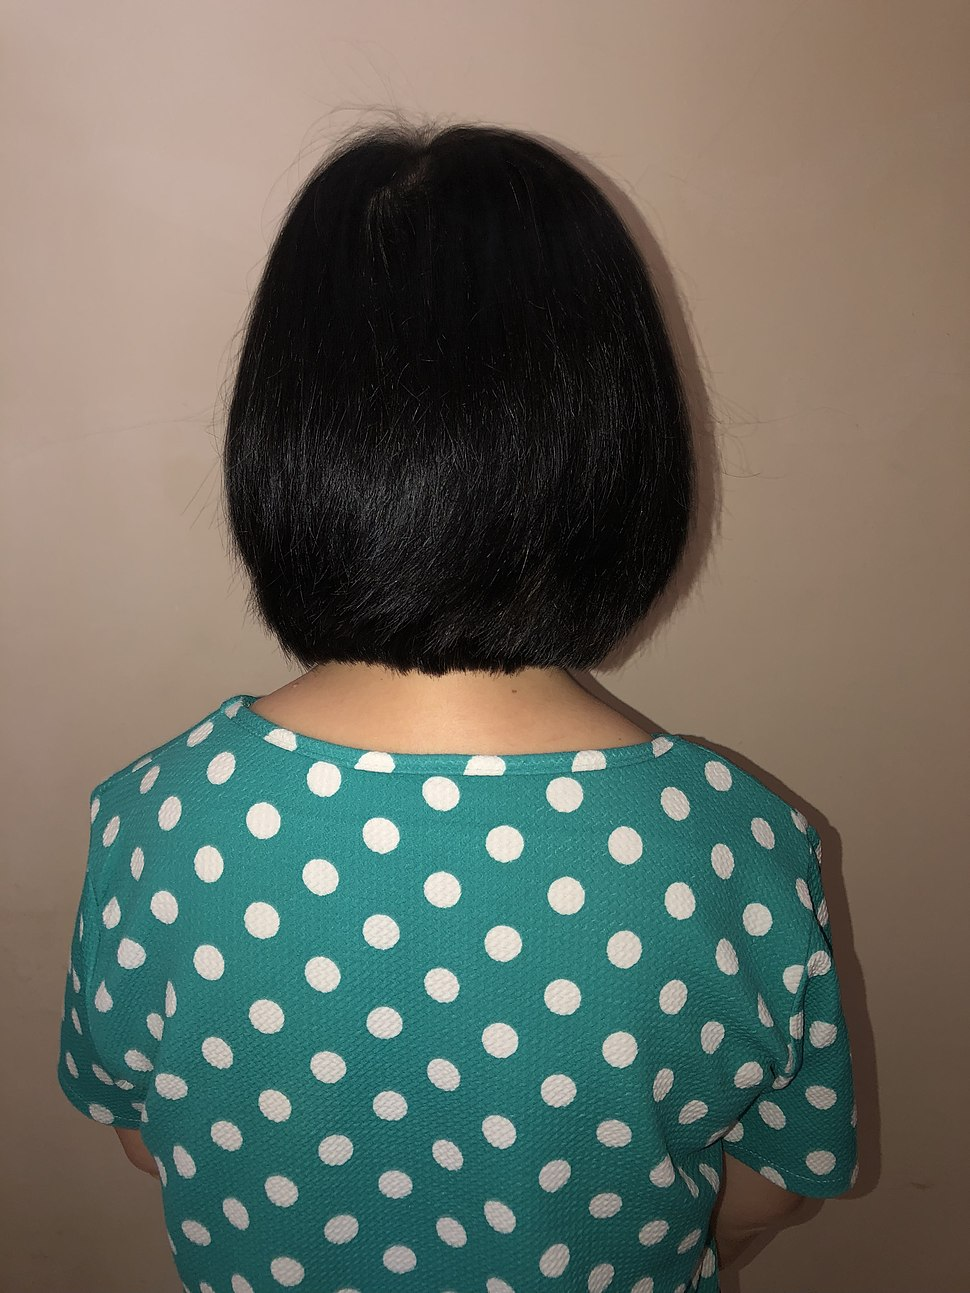 Suggest long hair updo bouffant fetish